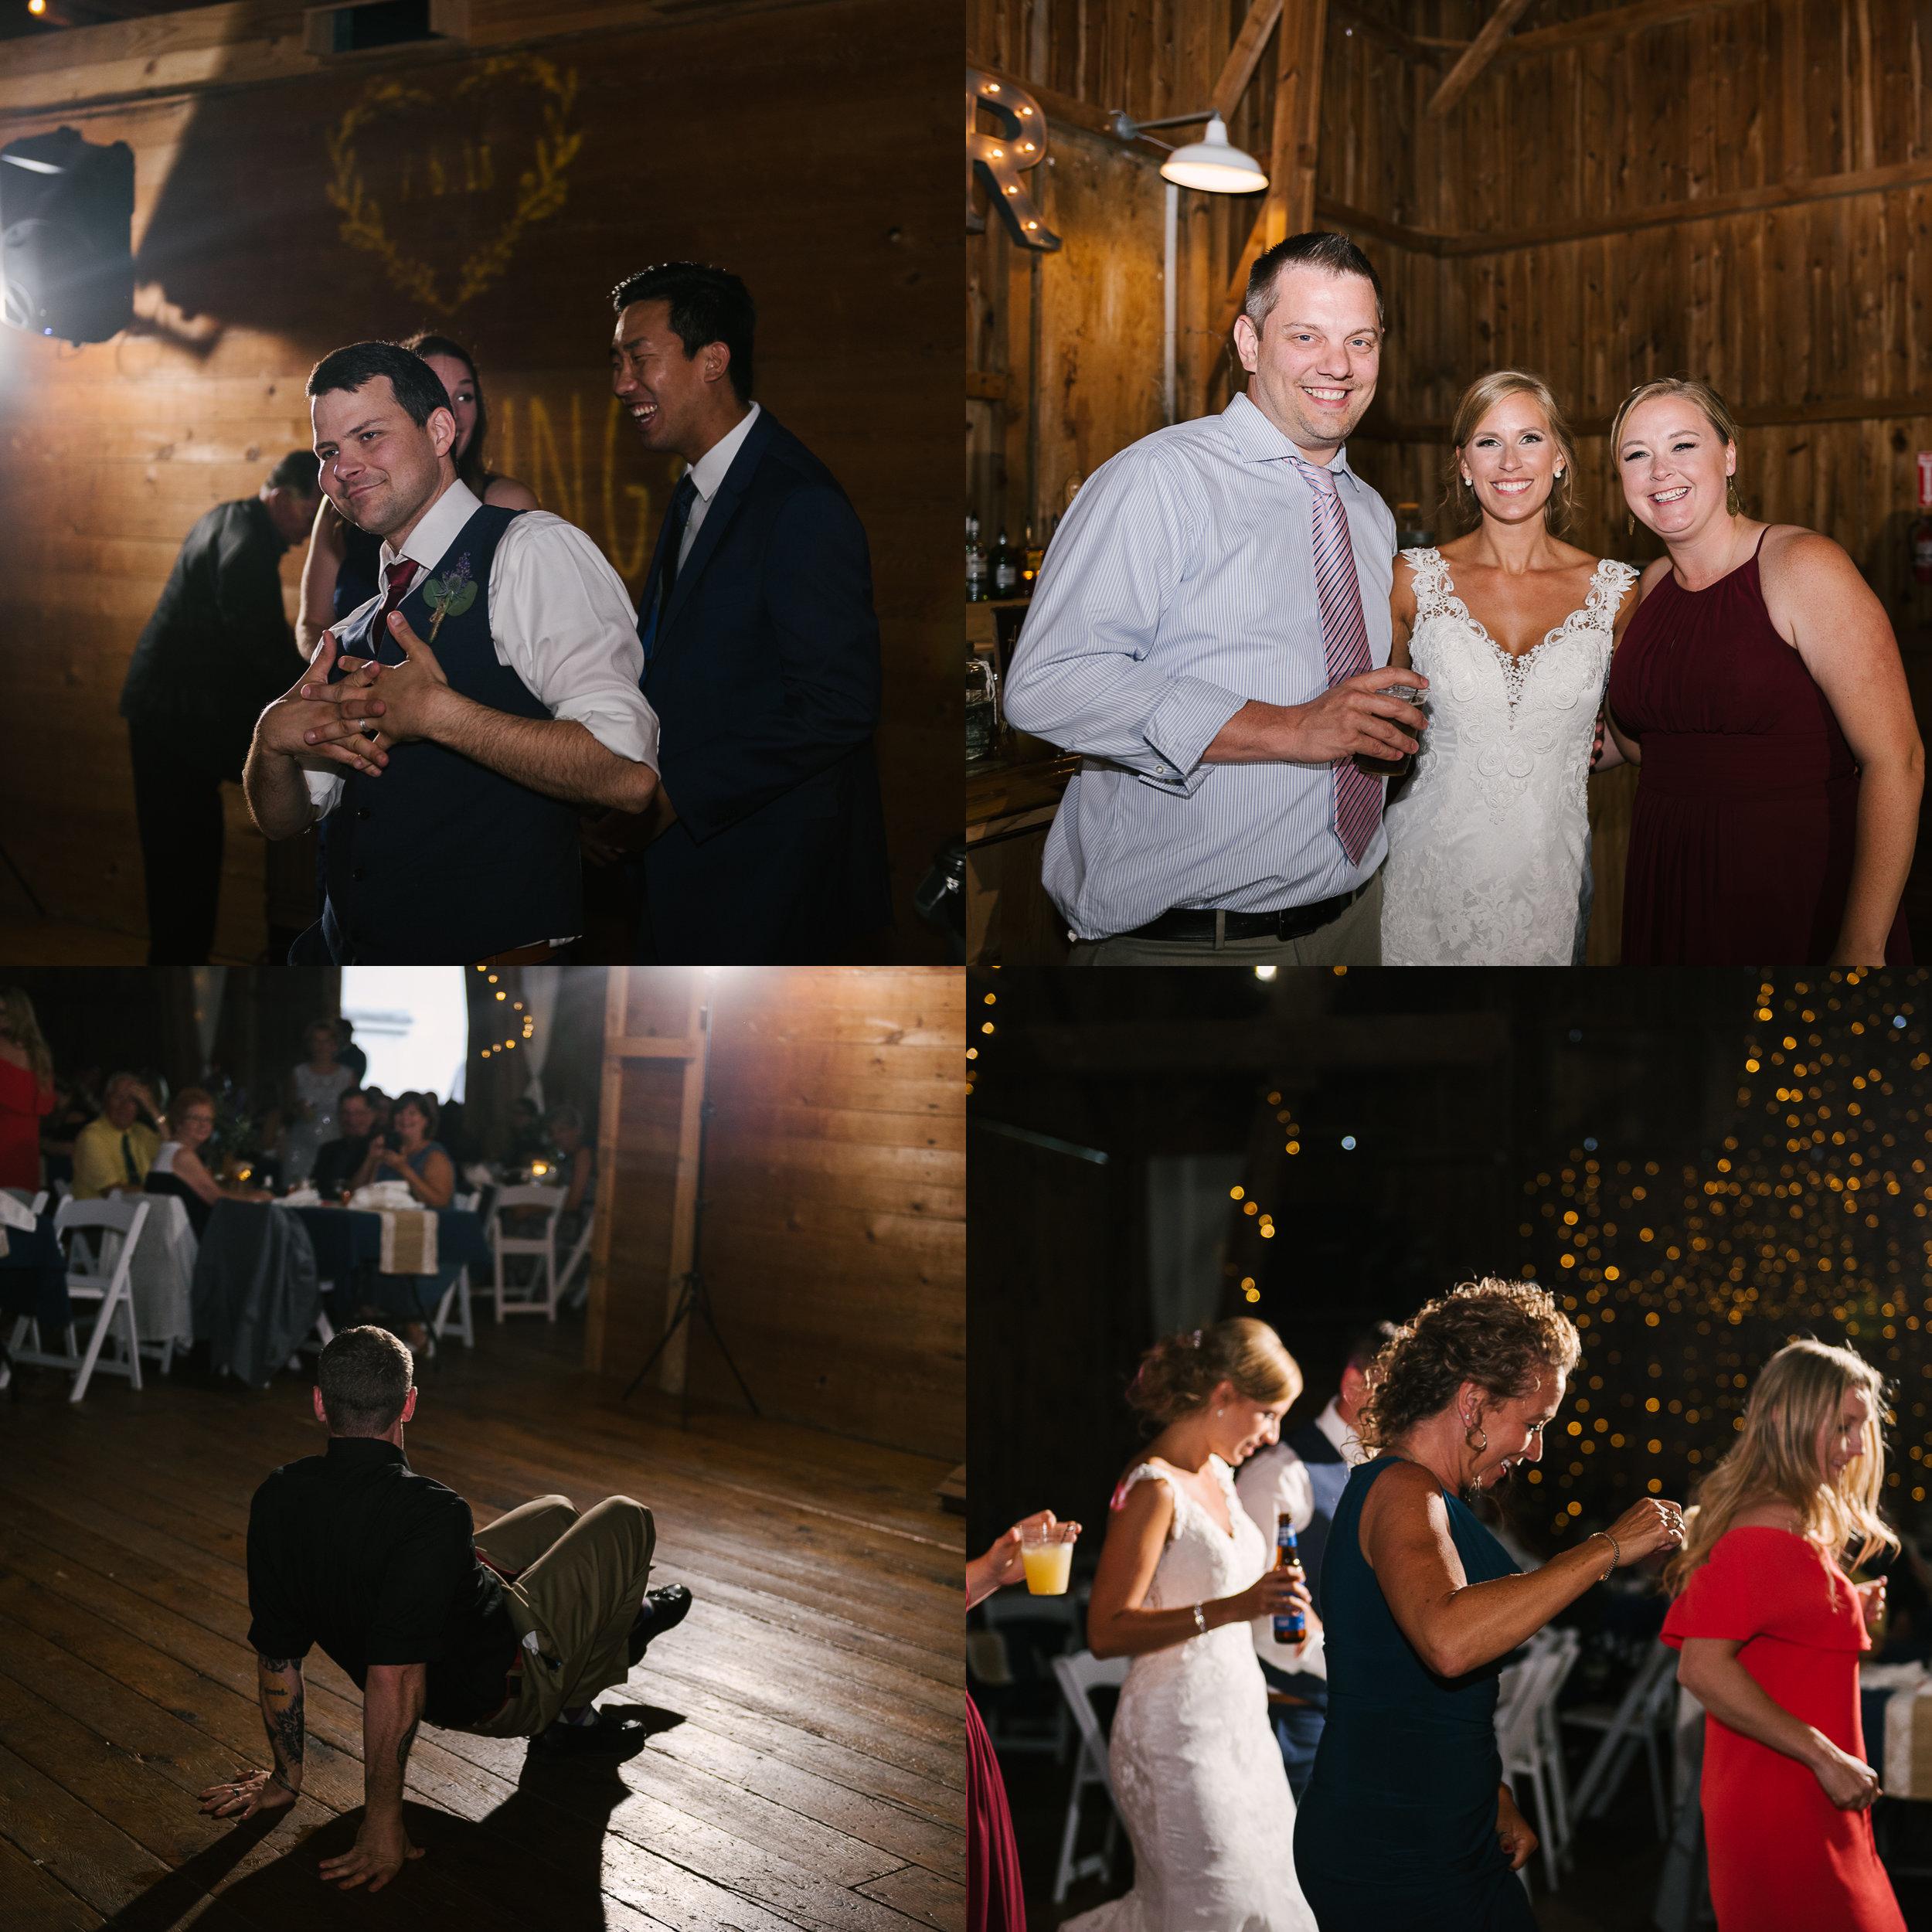 cobblestone-wedding-barn-rochester-photography-42.jpg